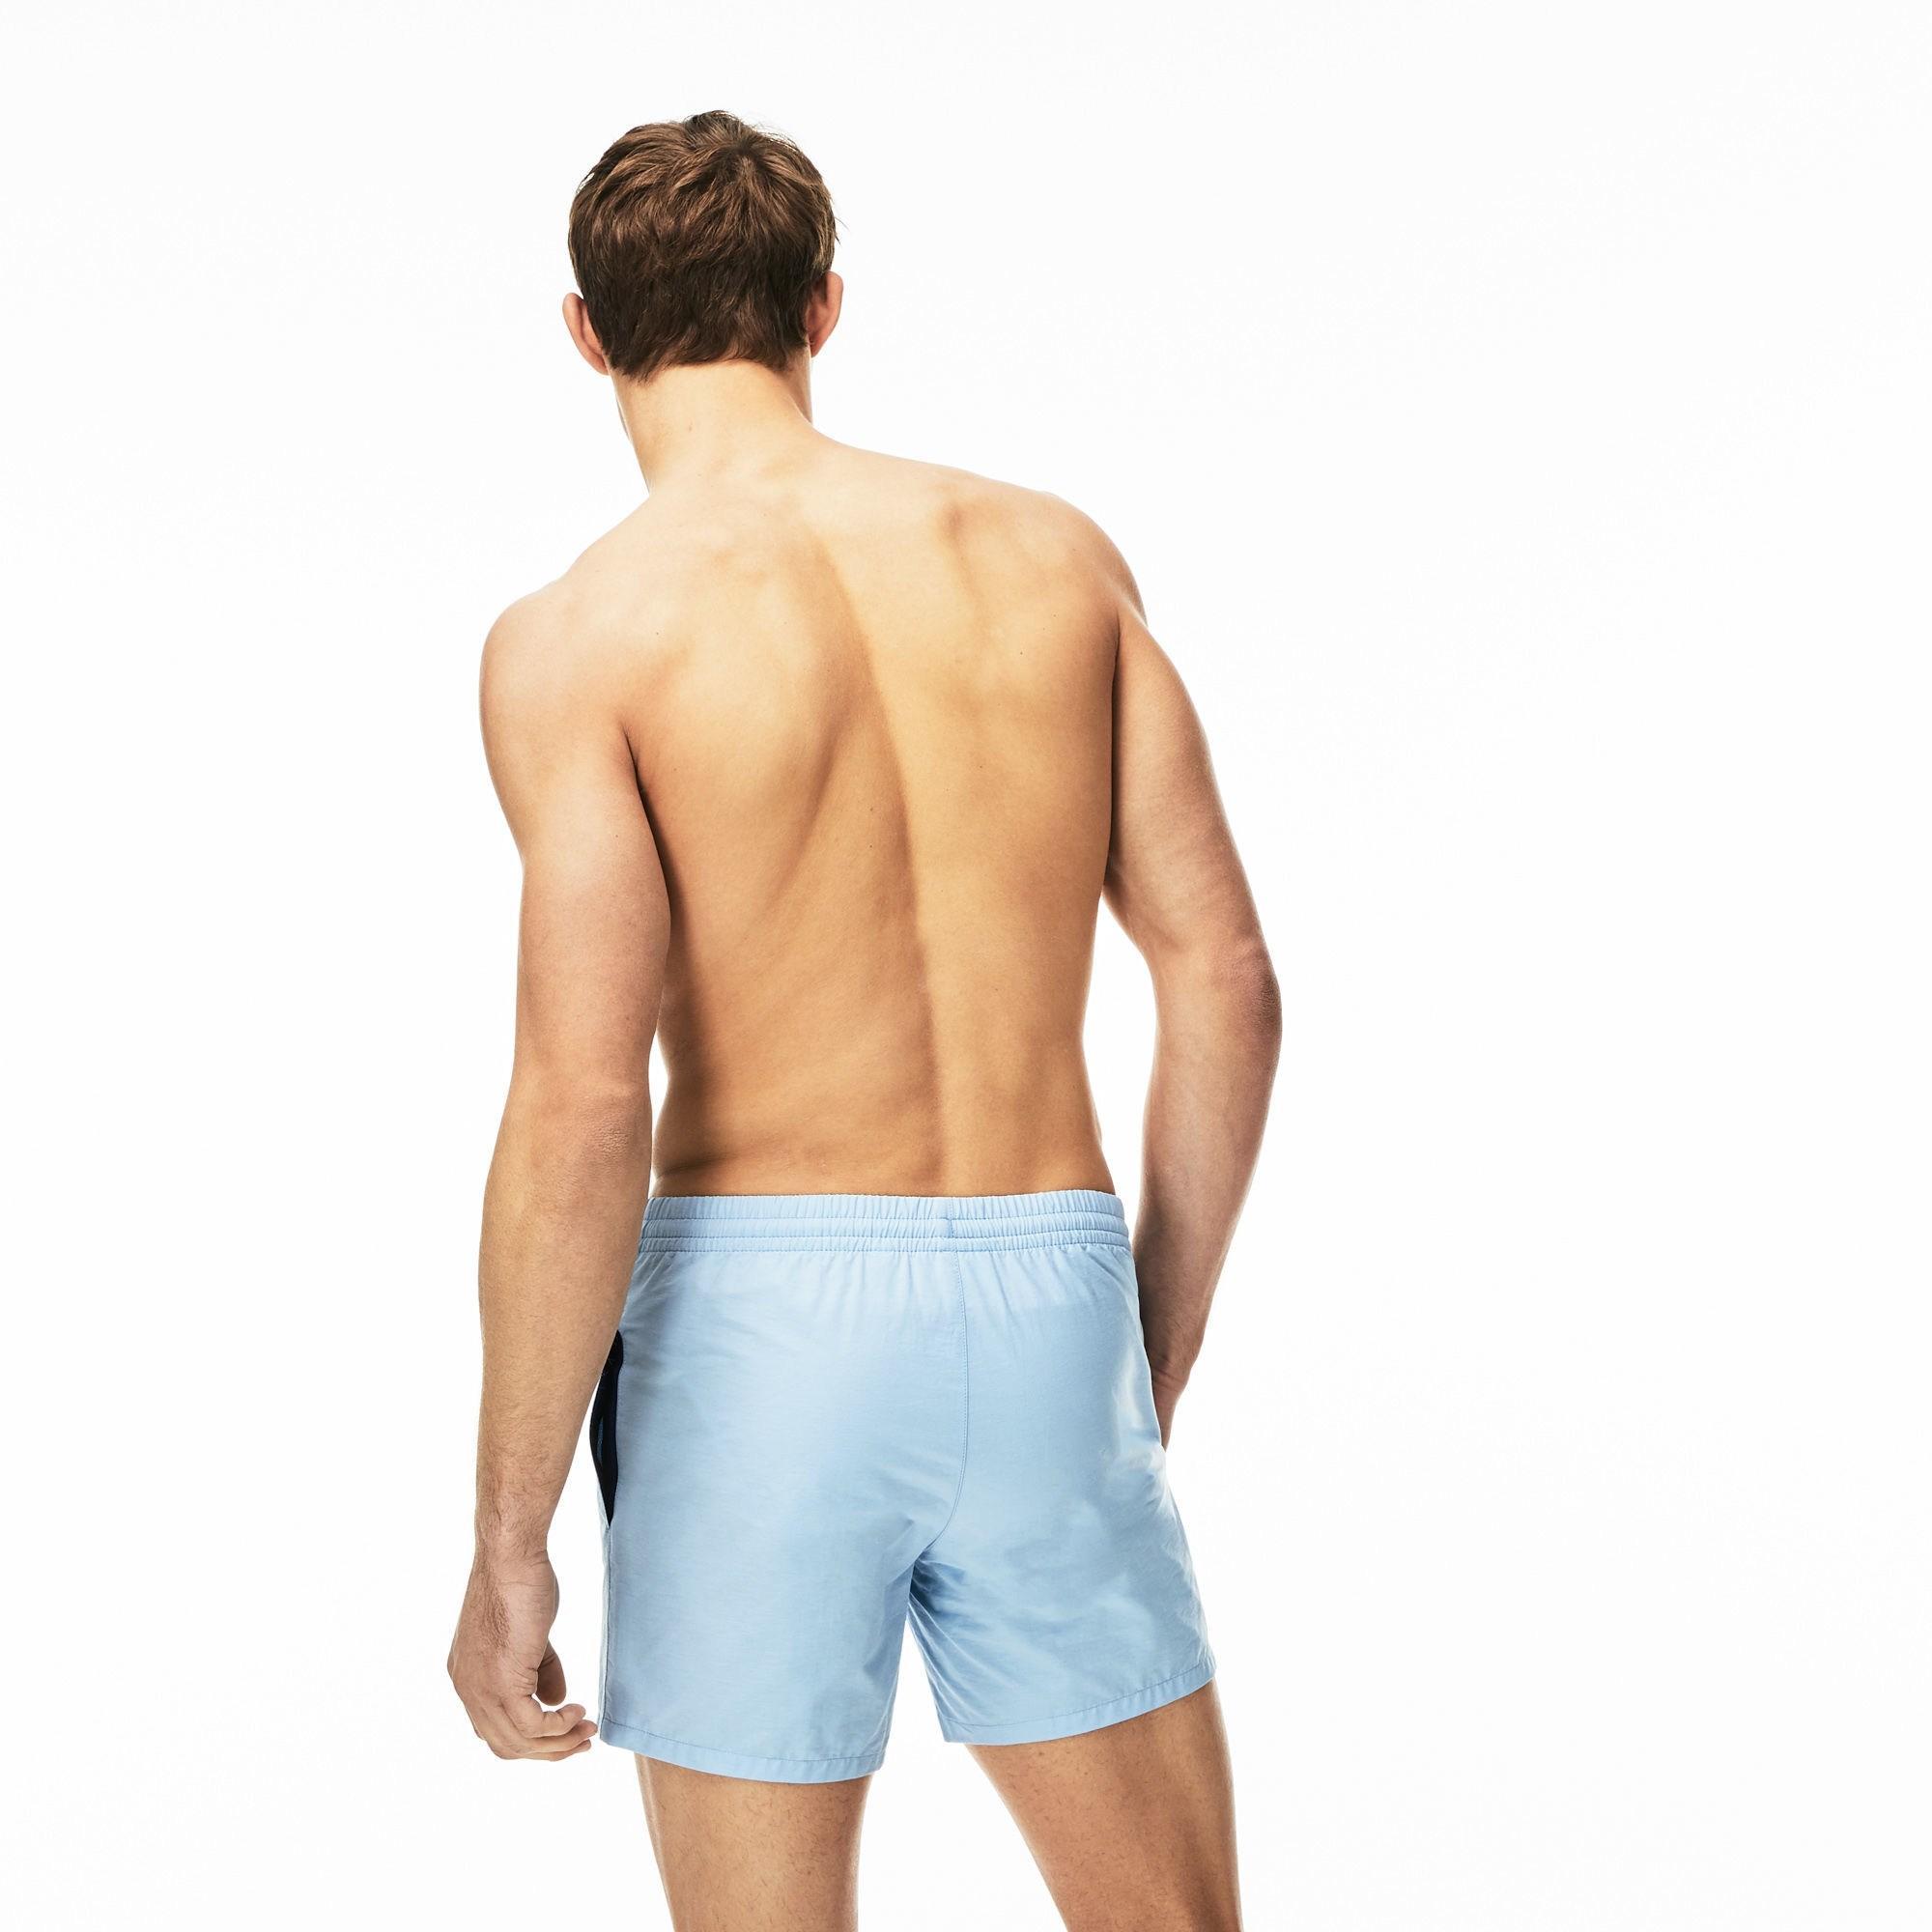 f27ec05f28 Lacoste - Blue Taffeta Swim Trunks for Men - Lyst. View fullscreen